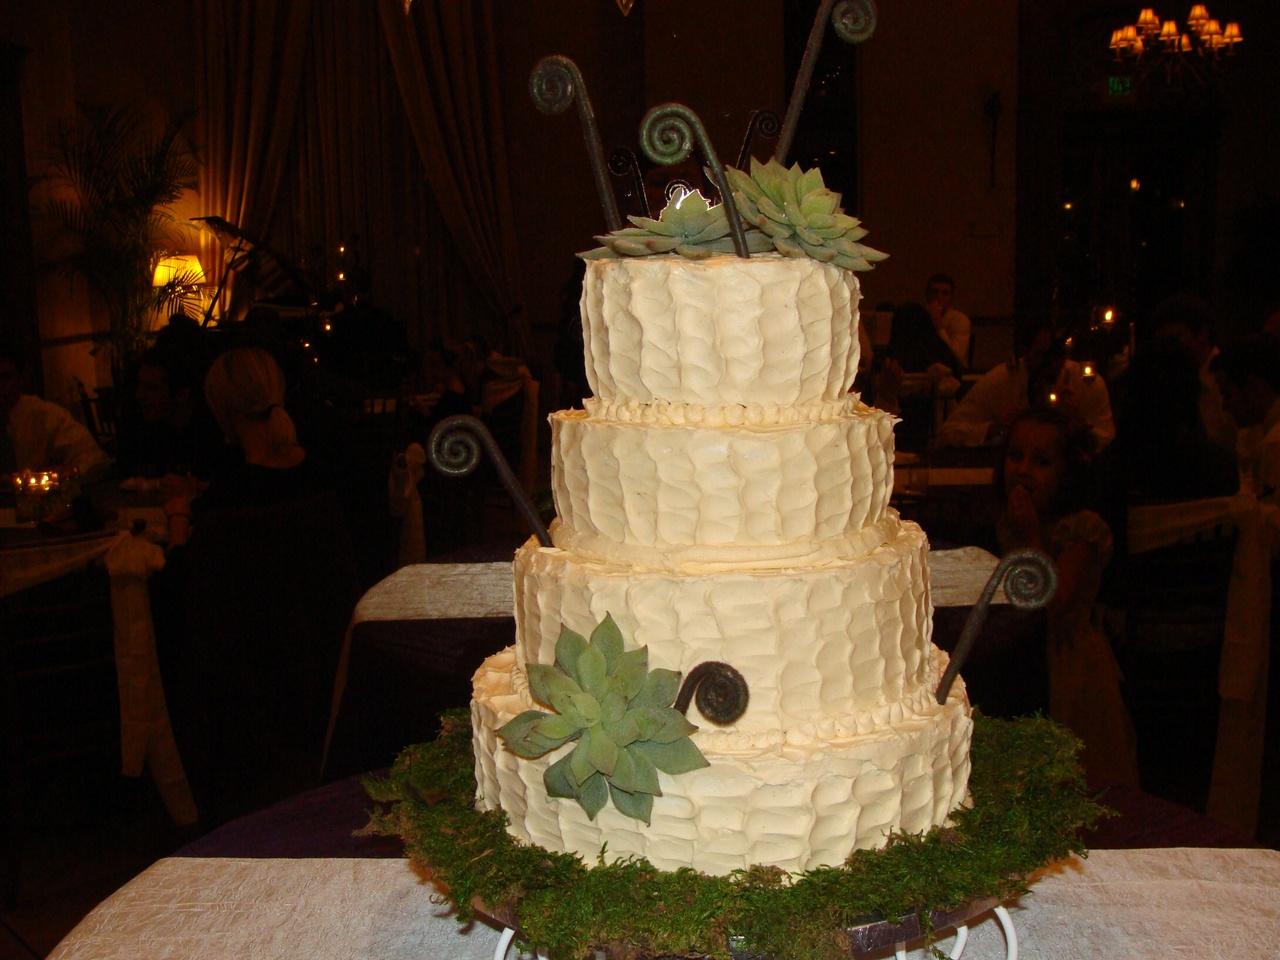 J & M Cakes